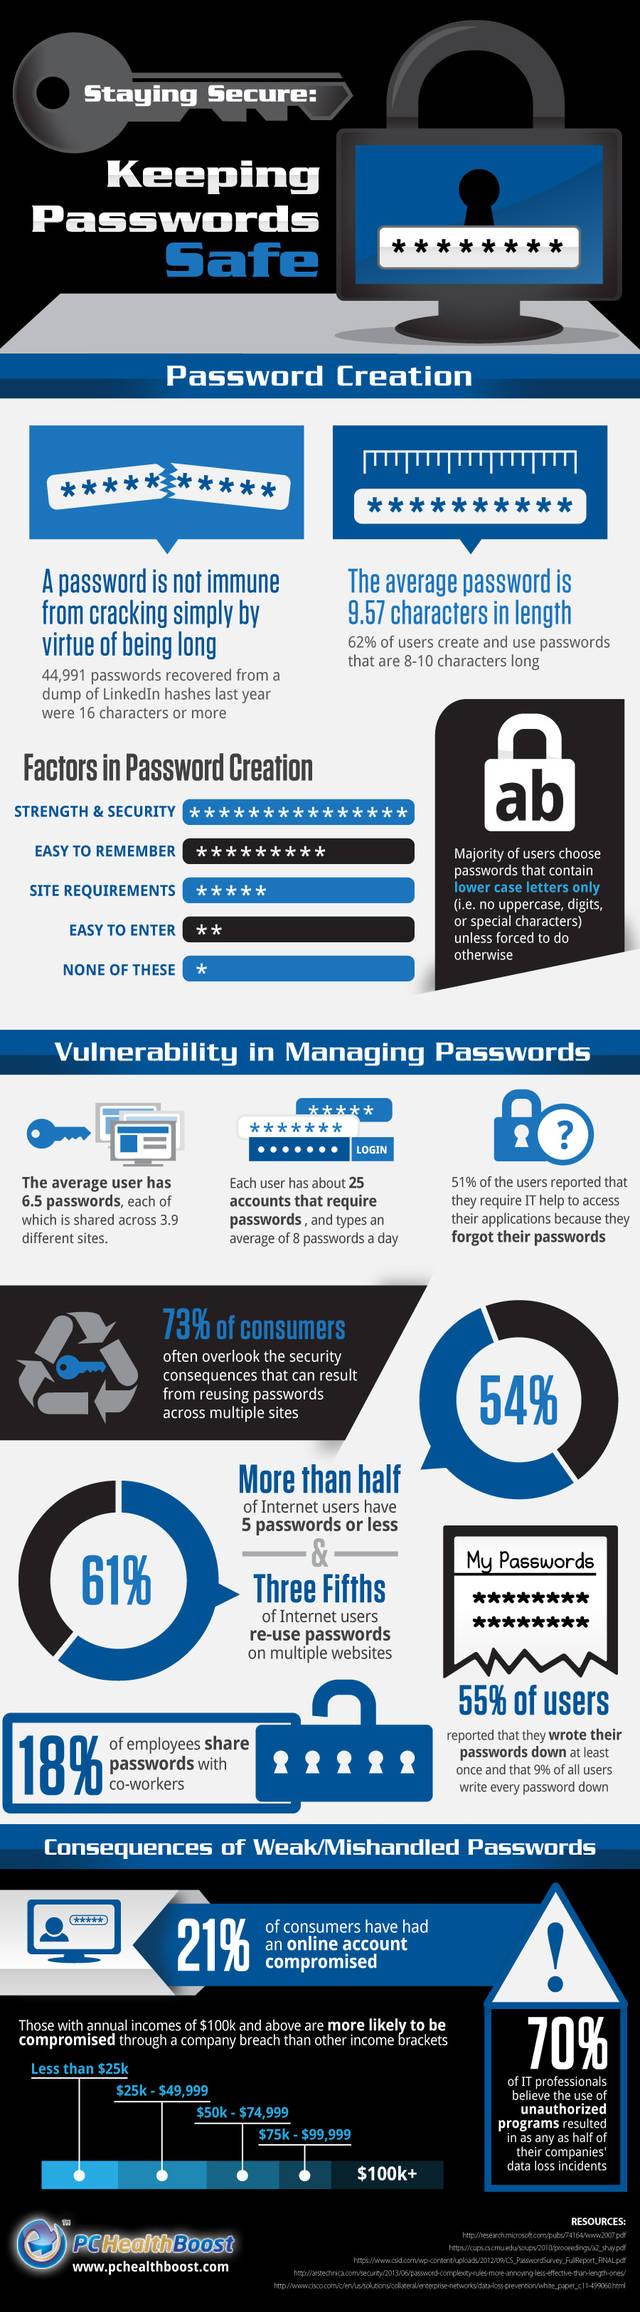 985 passwords